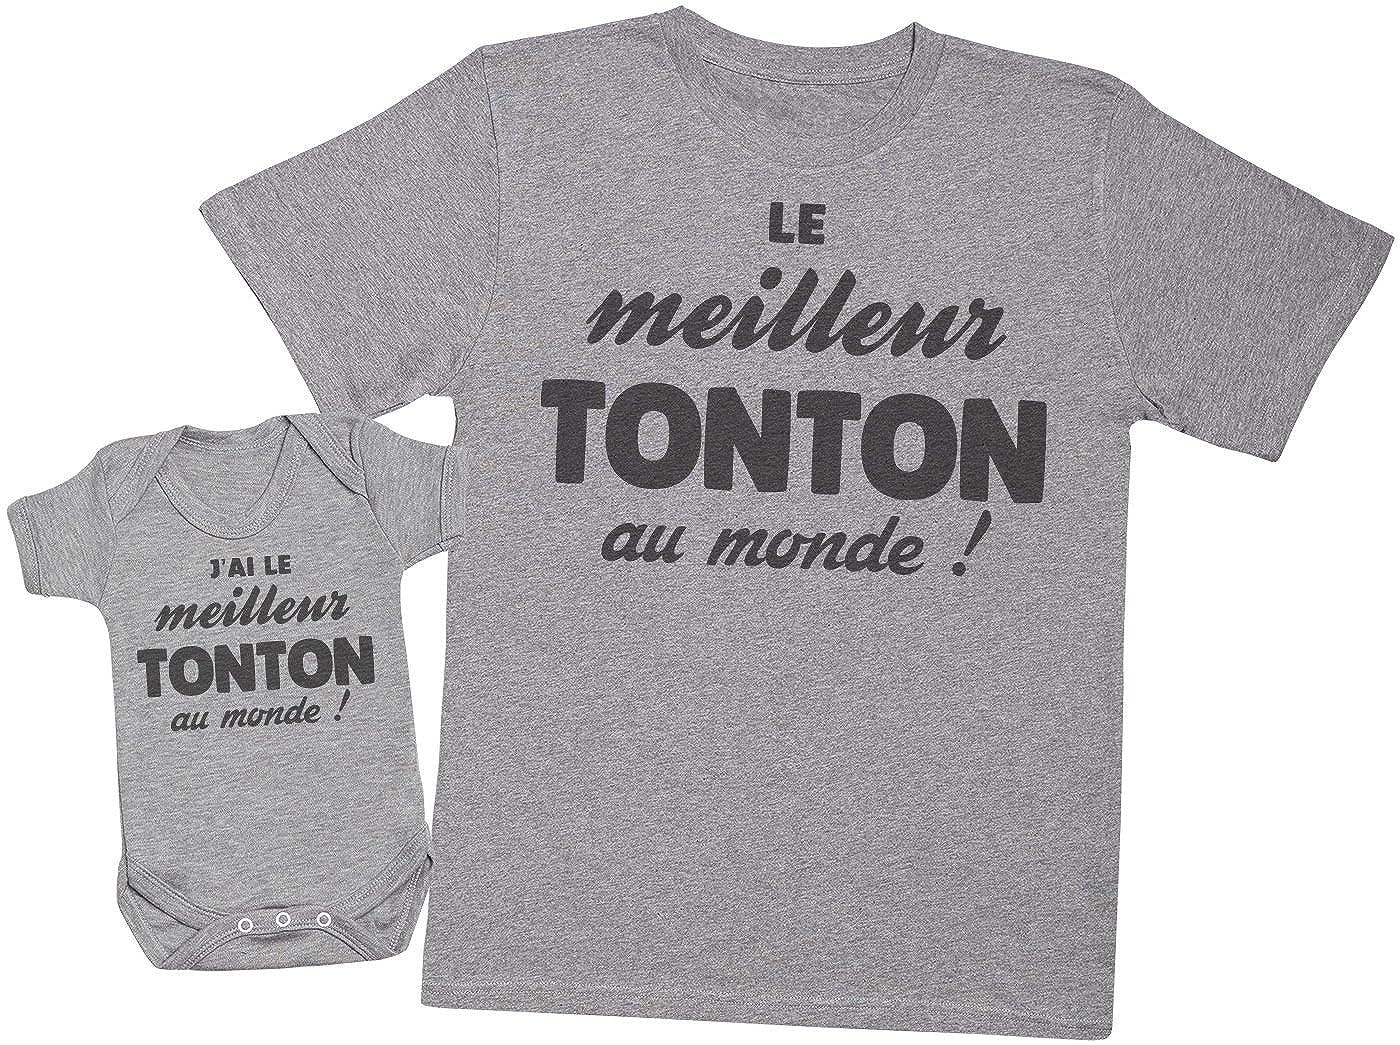 Ensemble Tonton B/éb/é Cadeau Zarlivia Clothing JAi Le Tonton au Monde! Hommes T-Shirt /& Body b/éb/é